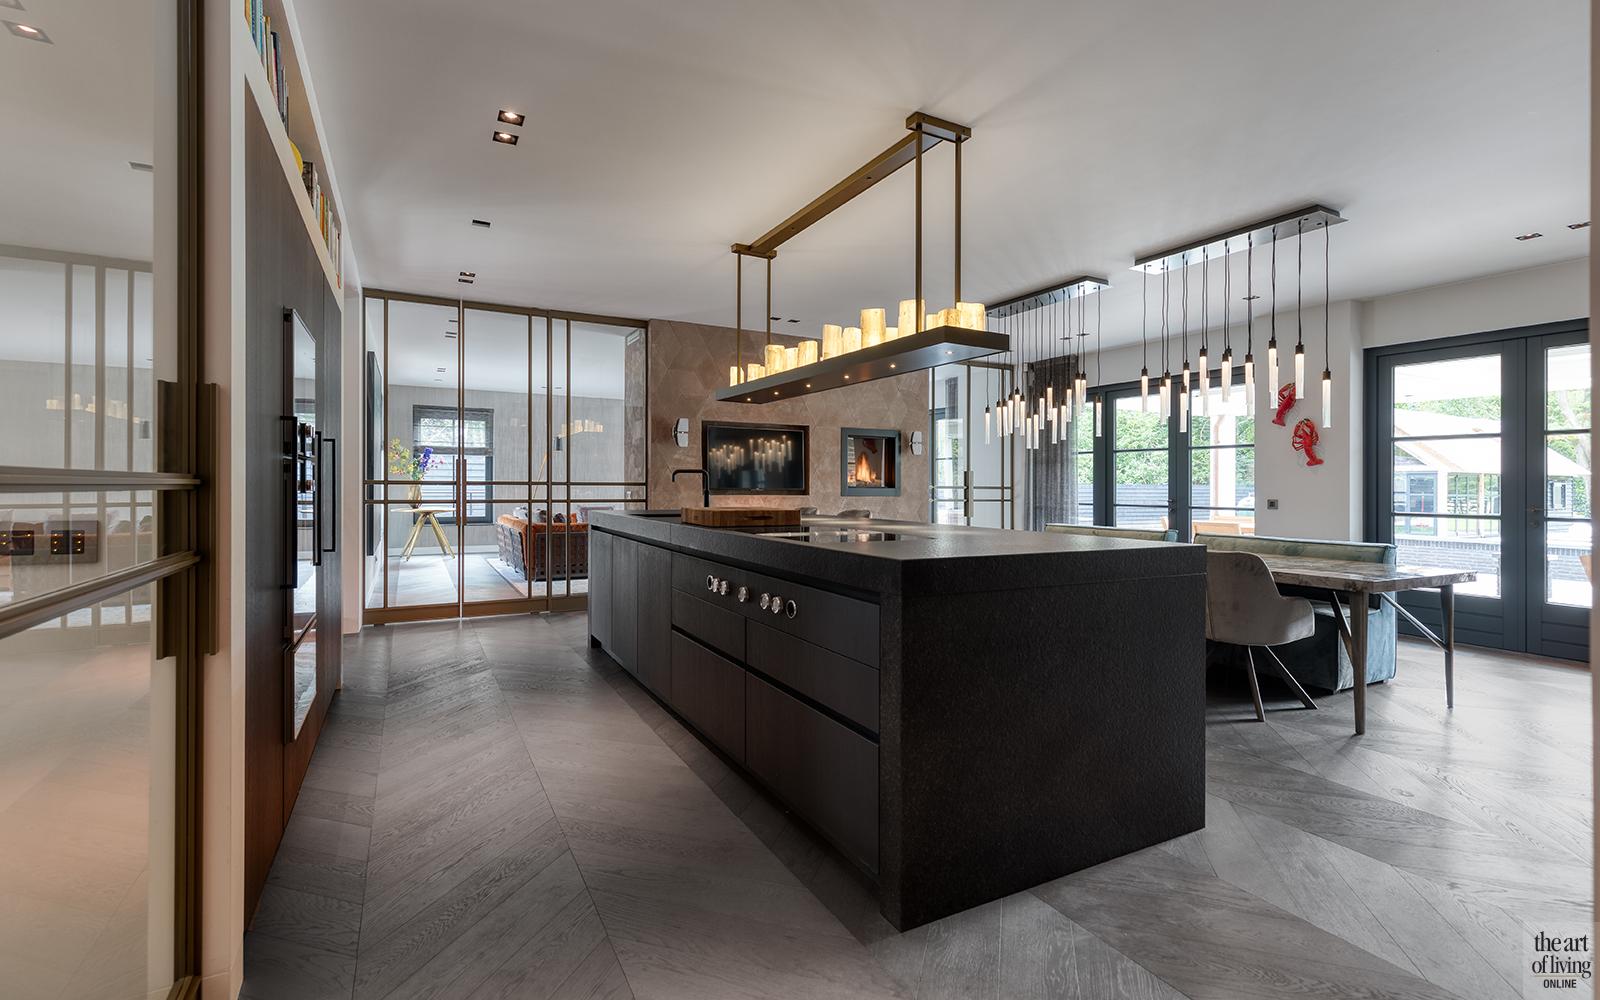 High end interieur, Herman Peters, High end interieur, Herman Peters, Keuken, design keuken, werkblad keuken, maatwerk keuken, keuken op maat